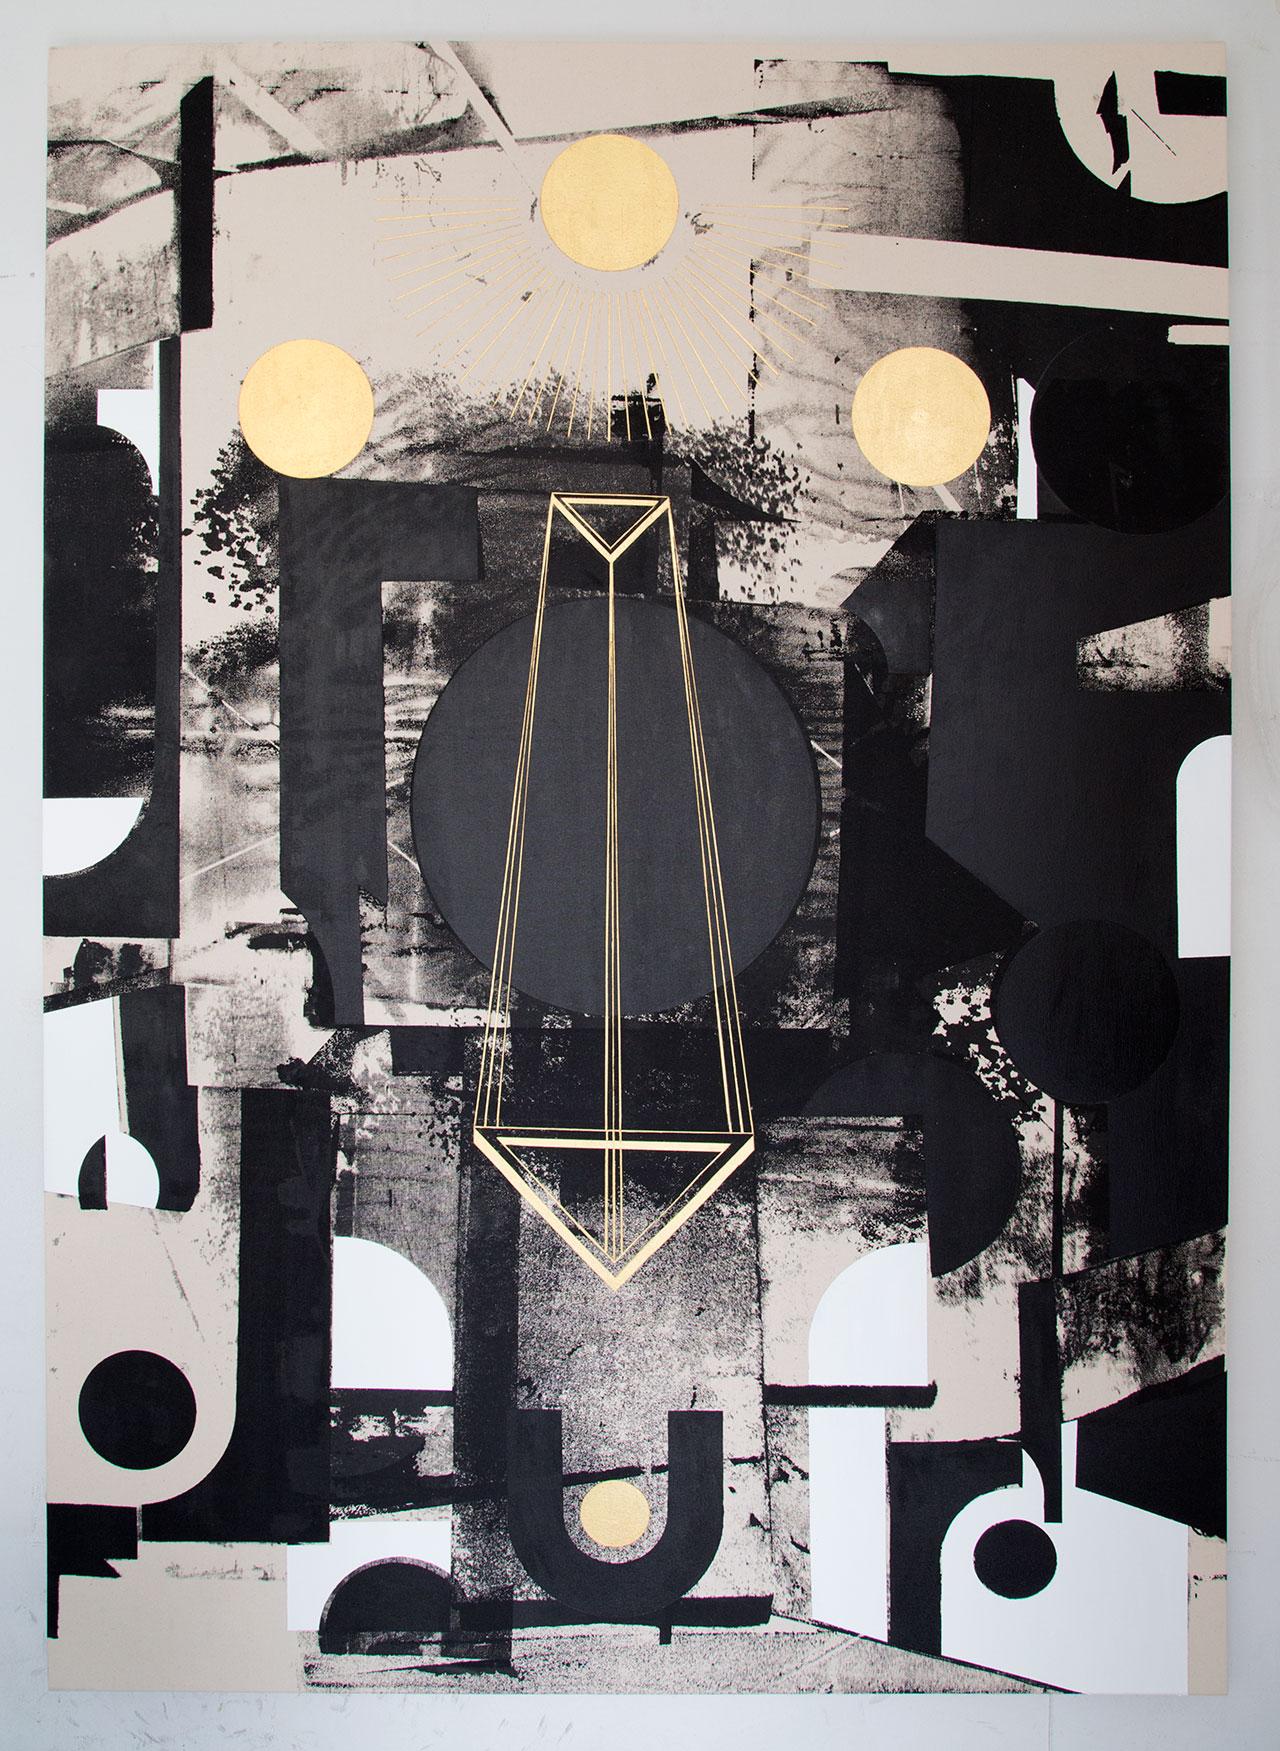 Panos Tsagaris, Untitled, gold leaf, acrylic paint and silkscreen on canvas, 180 x 130 cm, 2016. Courtesy of the artist, MLFIMarie-Laure Fleisch, (Rome-Brussels)Kalfayan Galleries, (Athens-Thessaloniki).